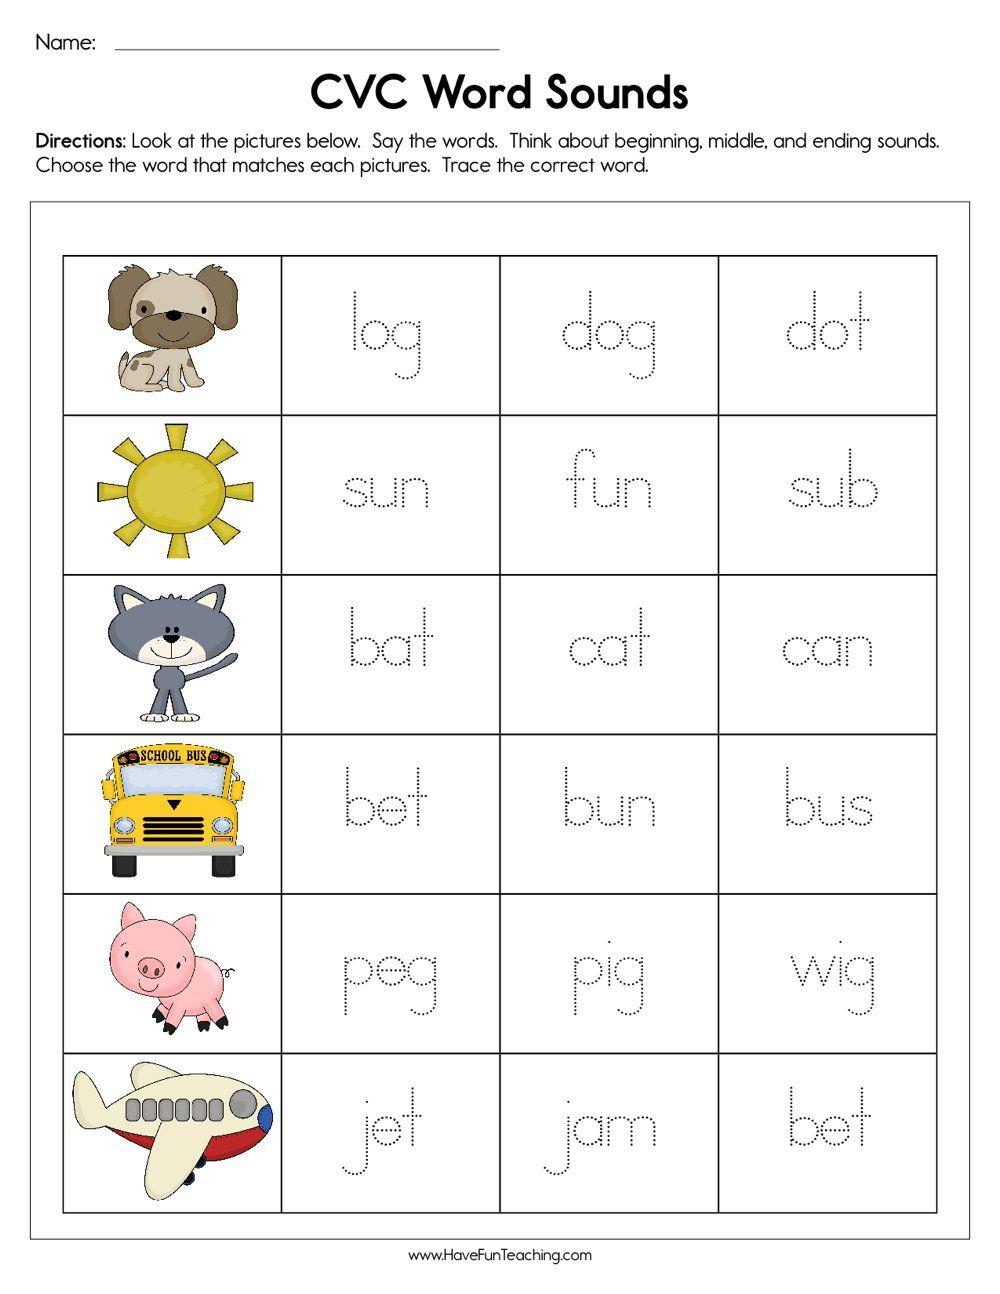 CVC Word Sounds Worksheet in 2020 Cvc words kindergarten